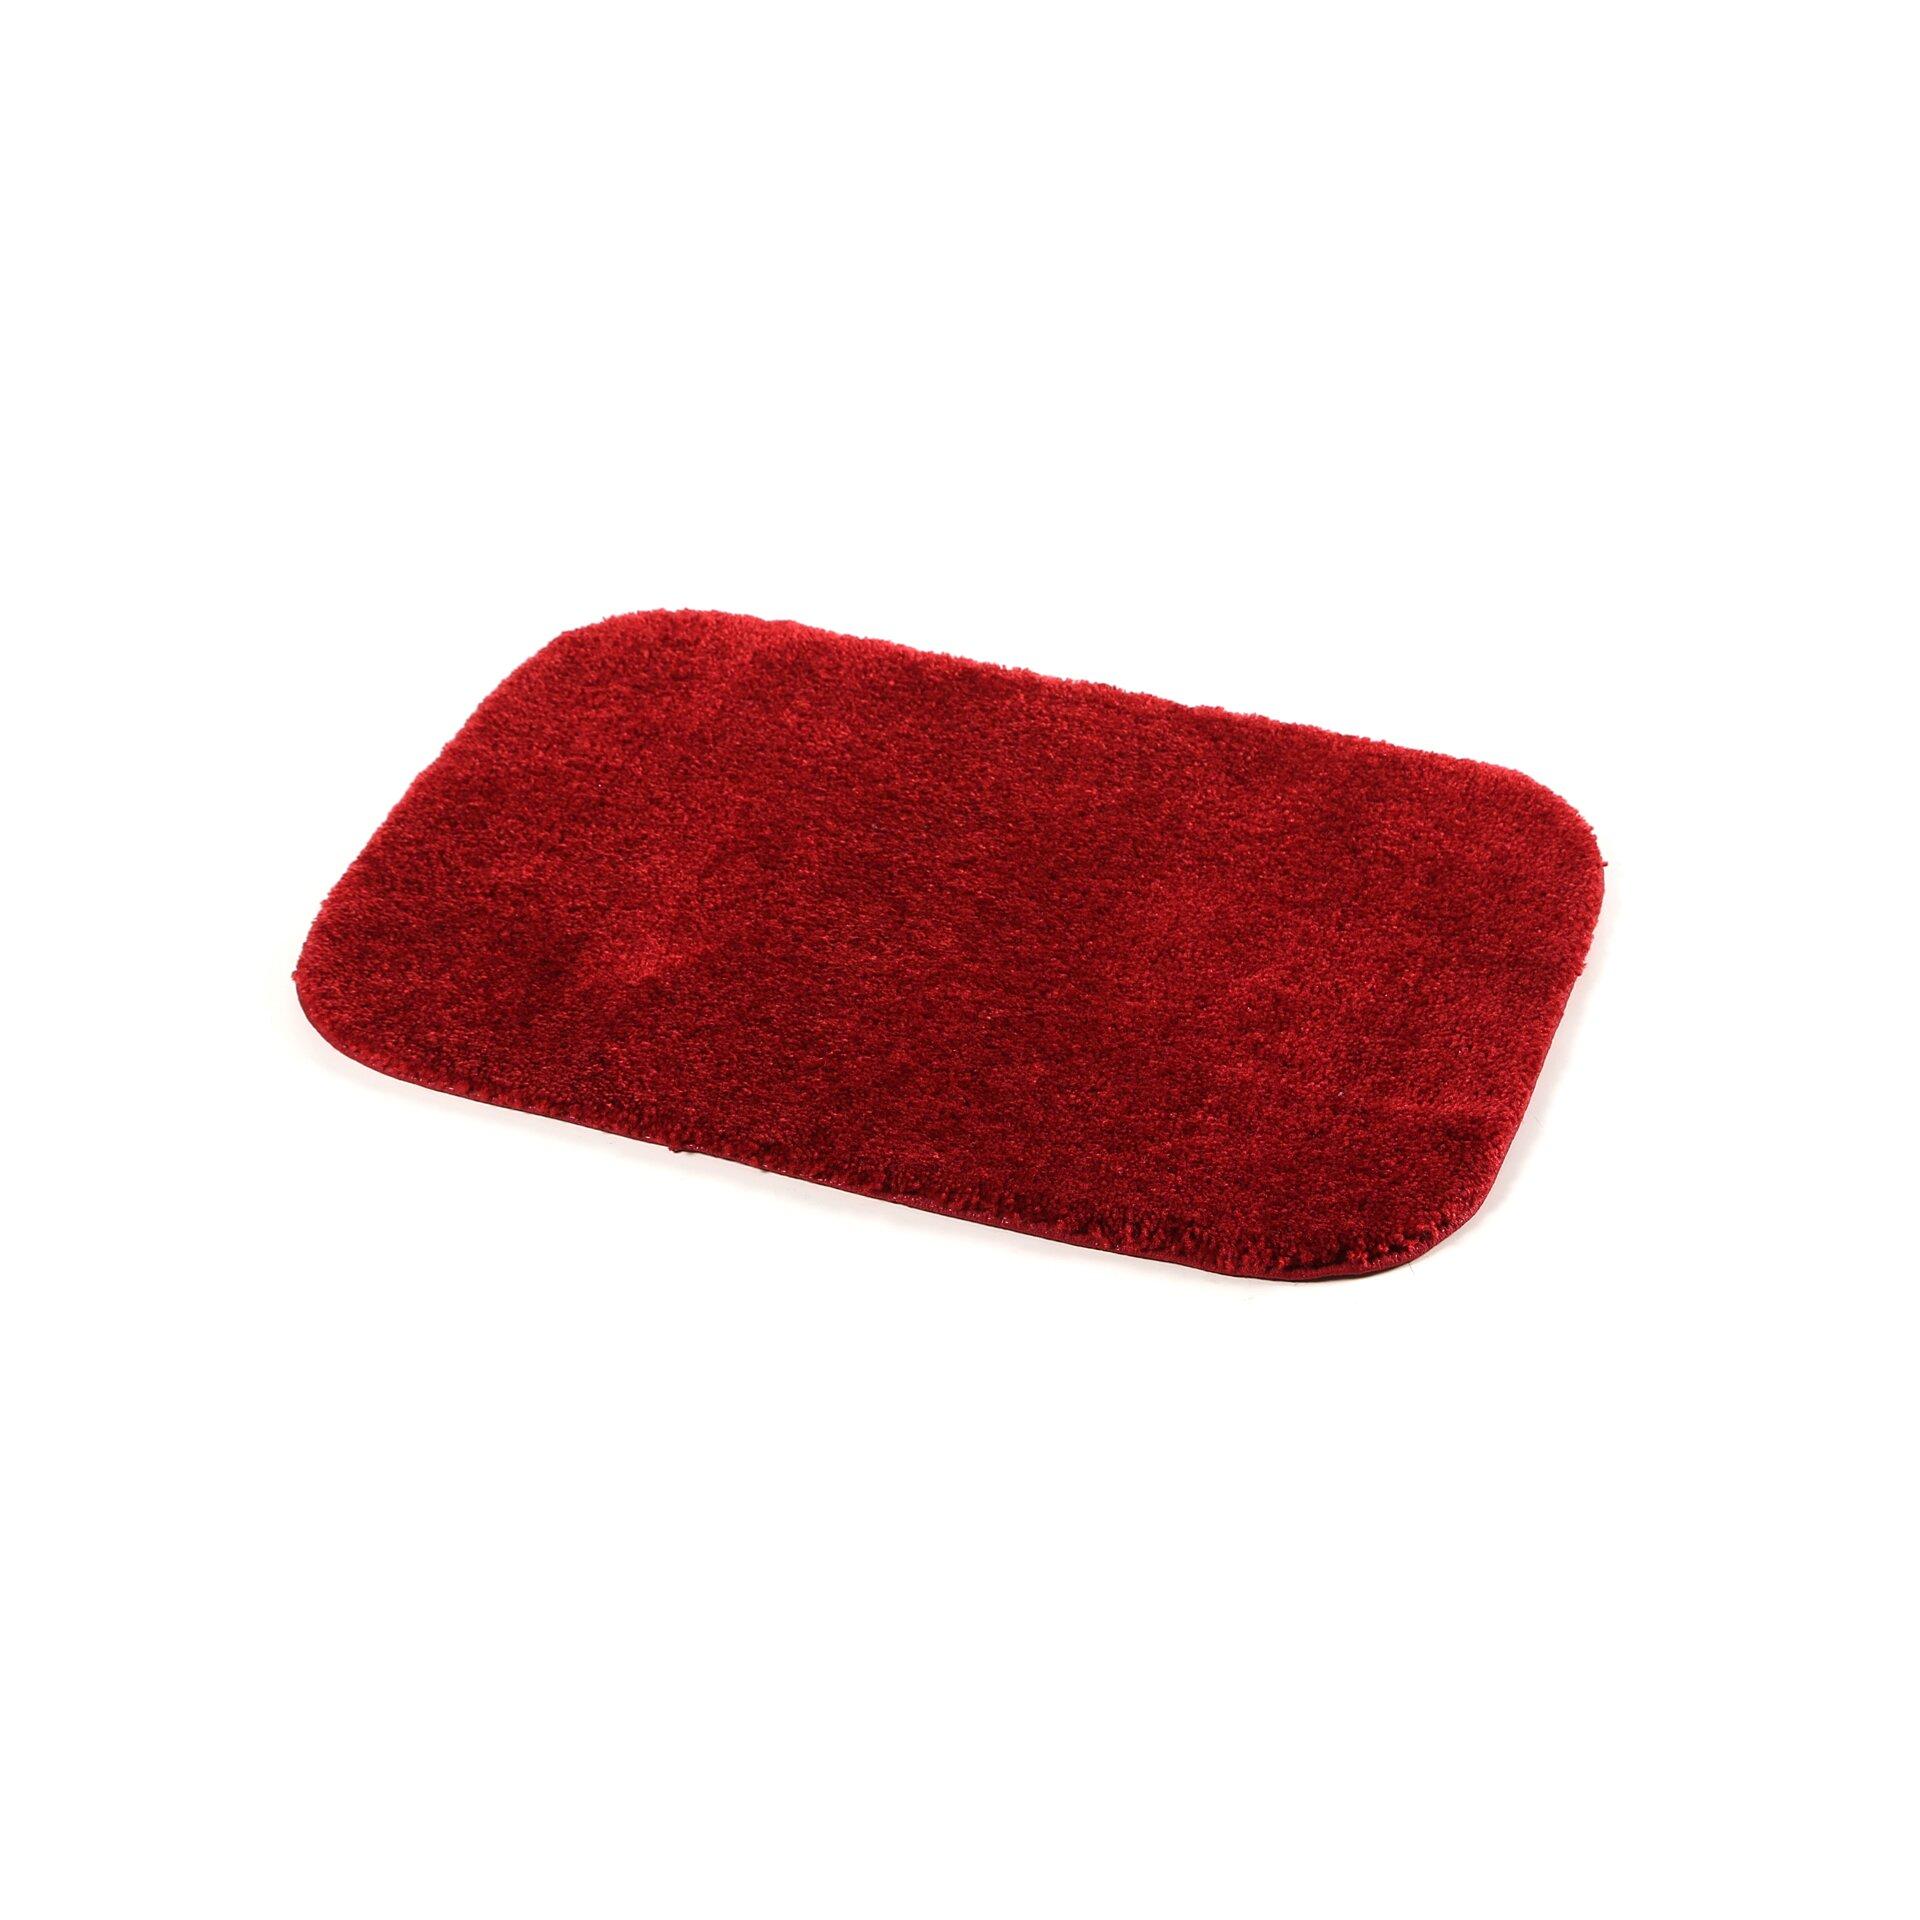 Model  Bathroom 3 Piece Rug Set Chili Pepper Red  Home  Bed Amp Bath  Bath